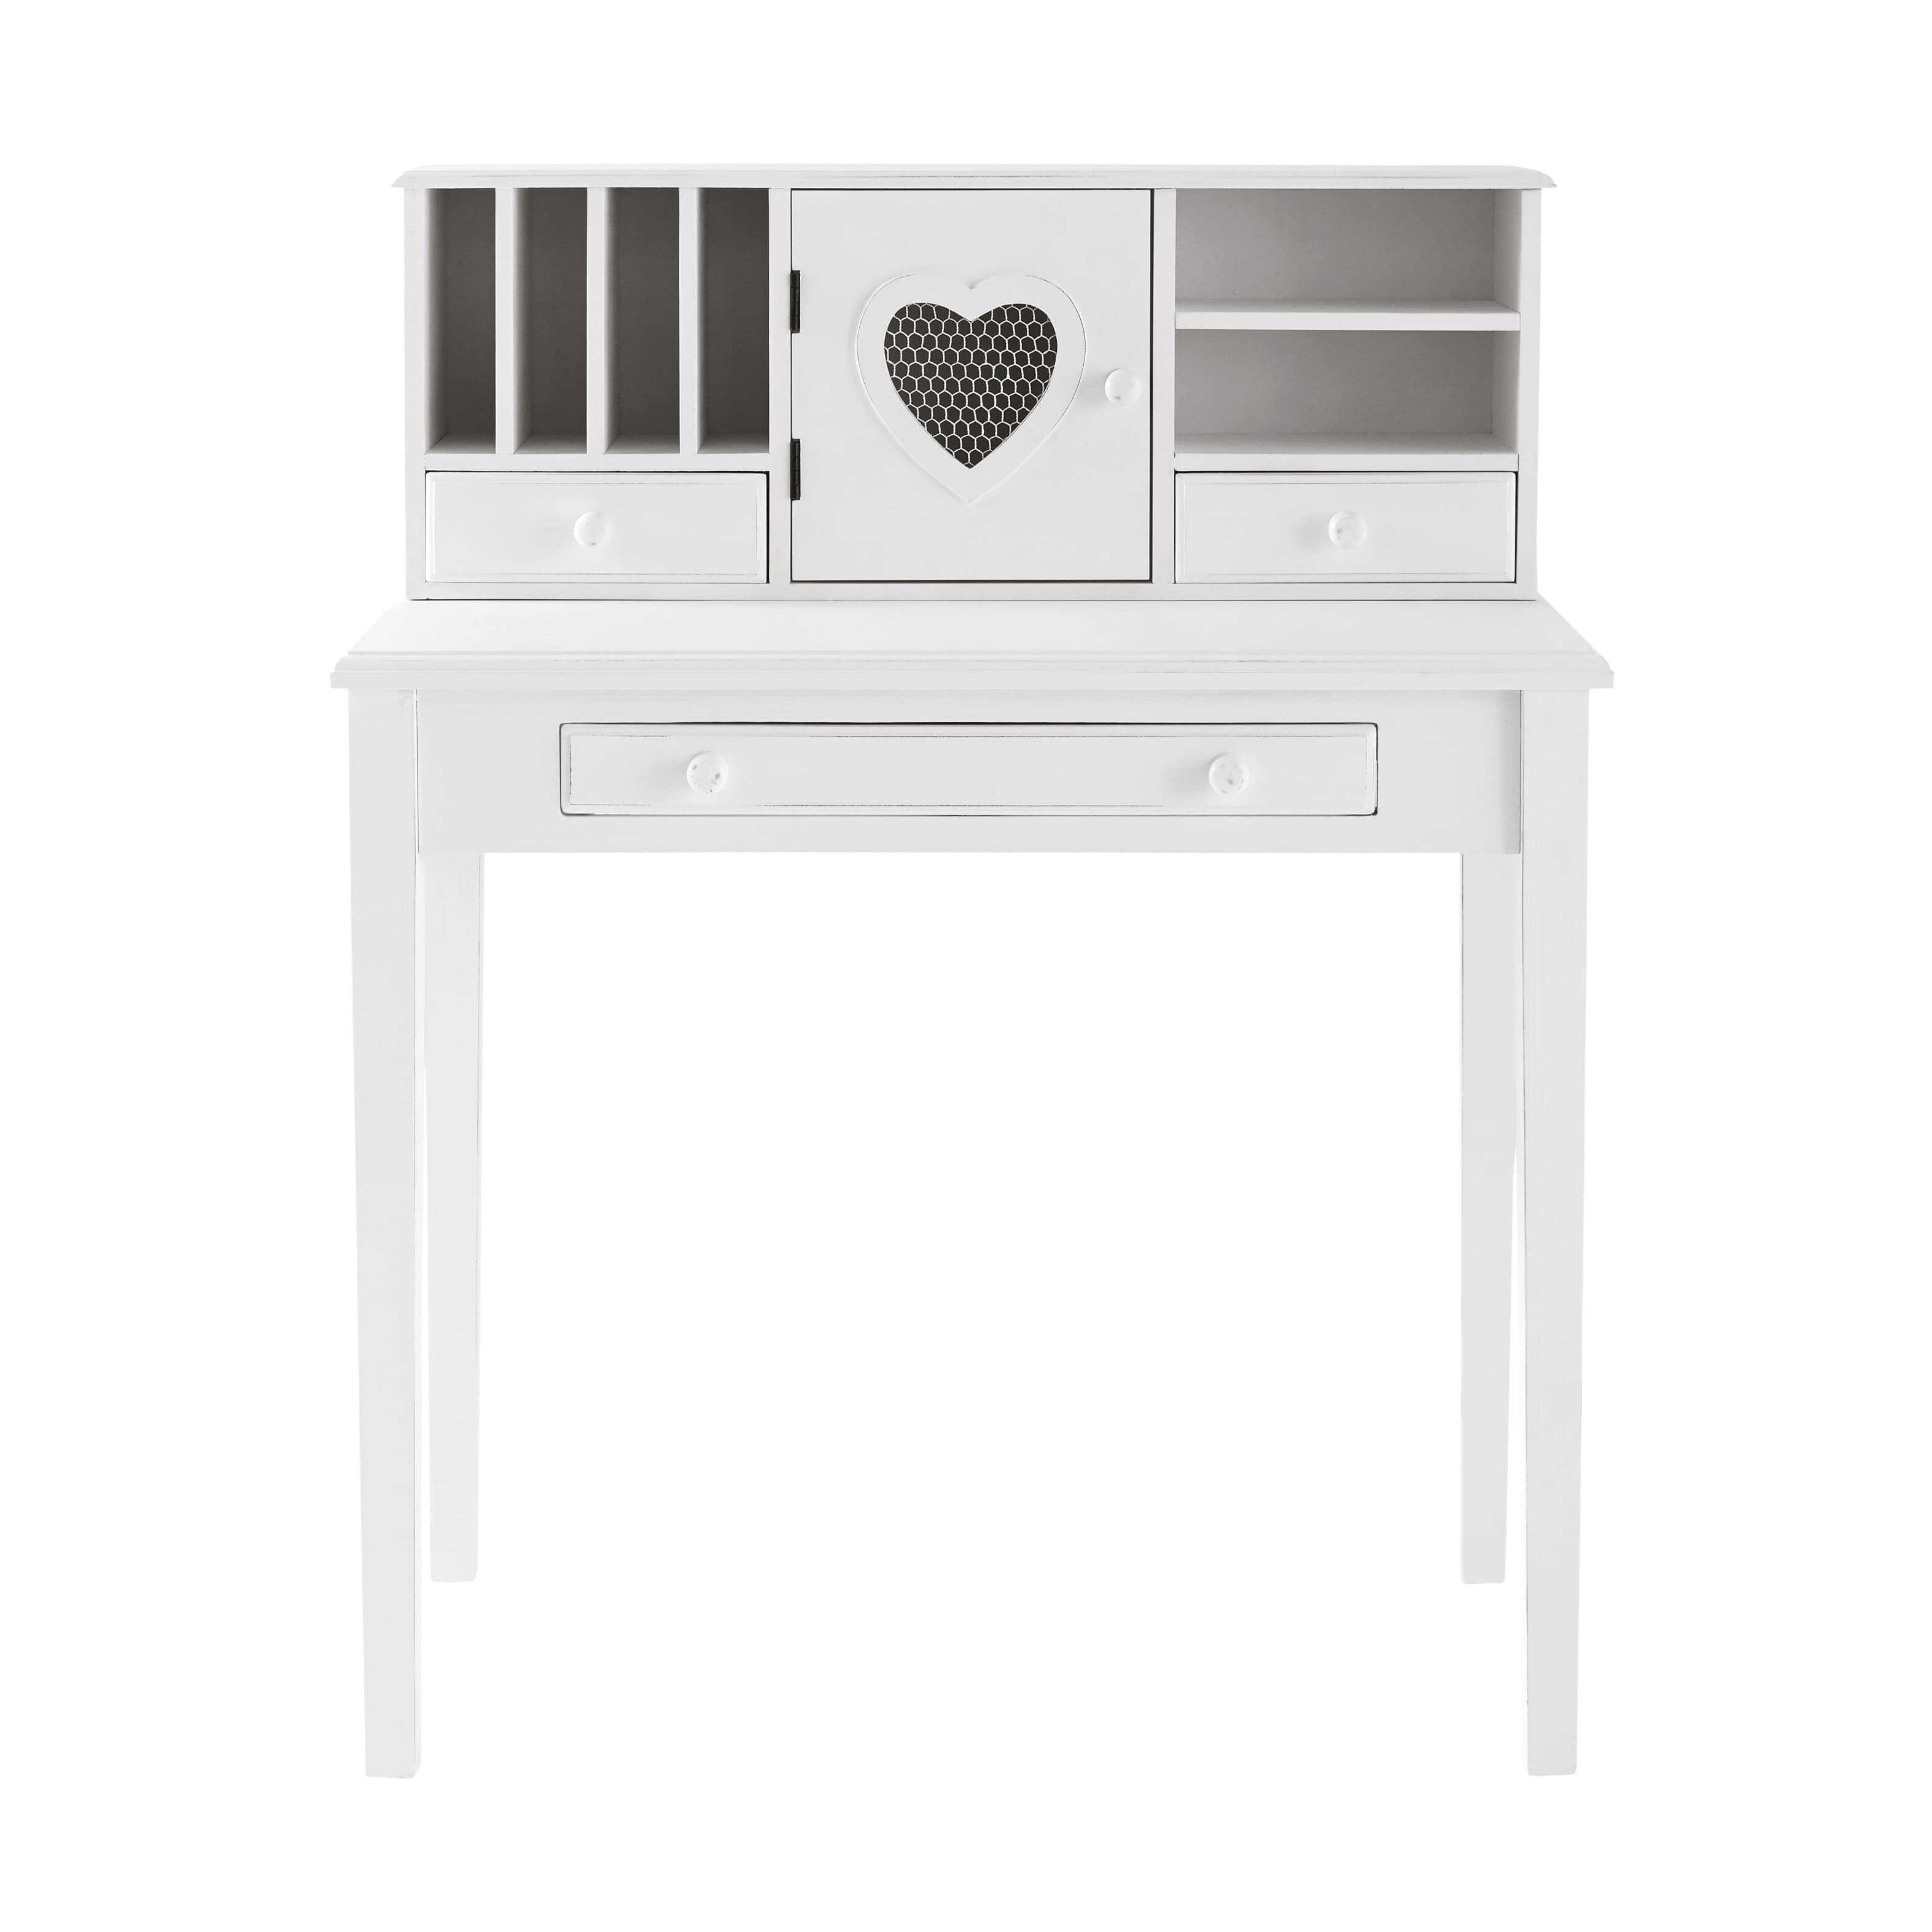 scrivania secrtaire bianca in legno l 86 cm valentine